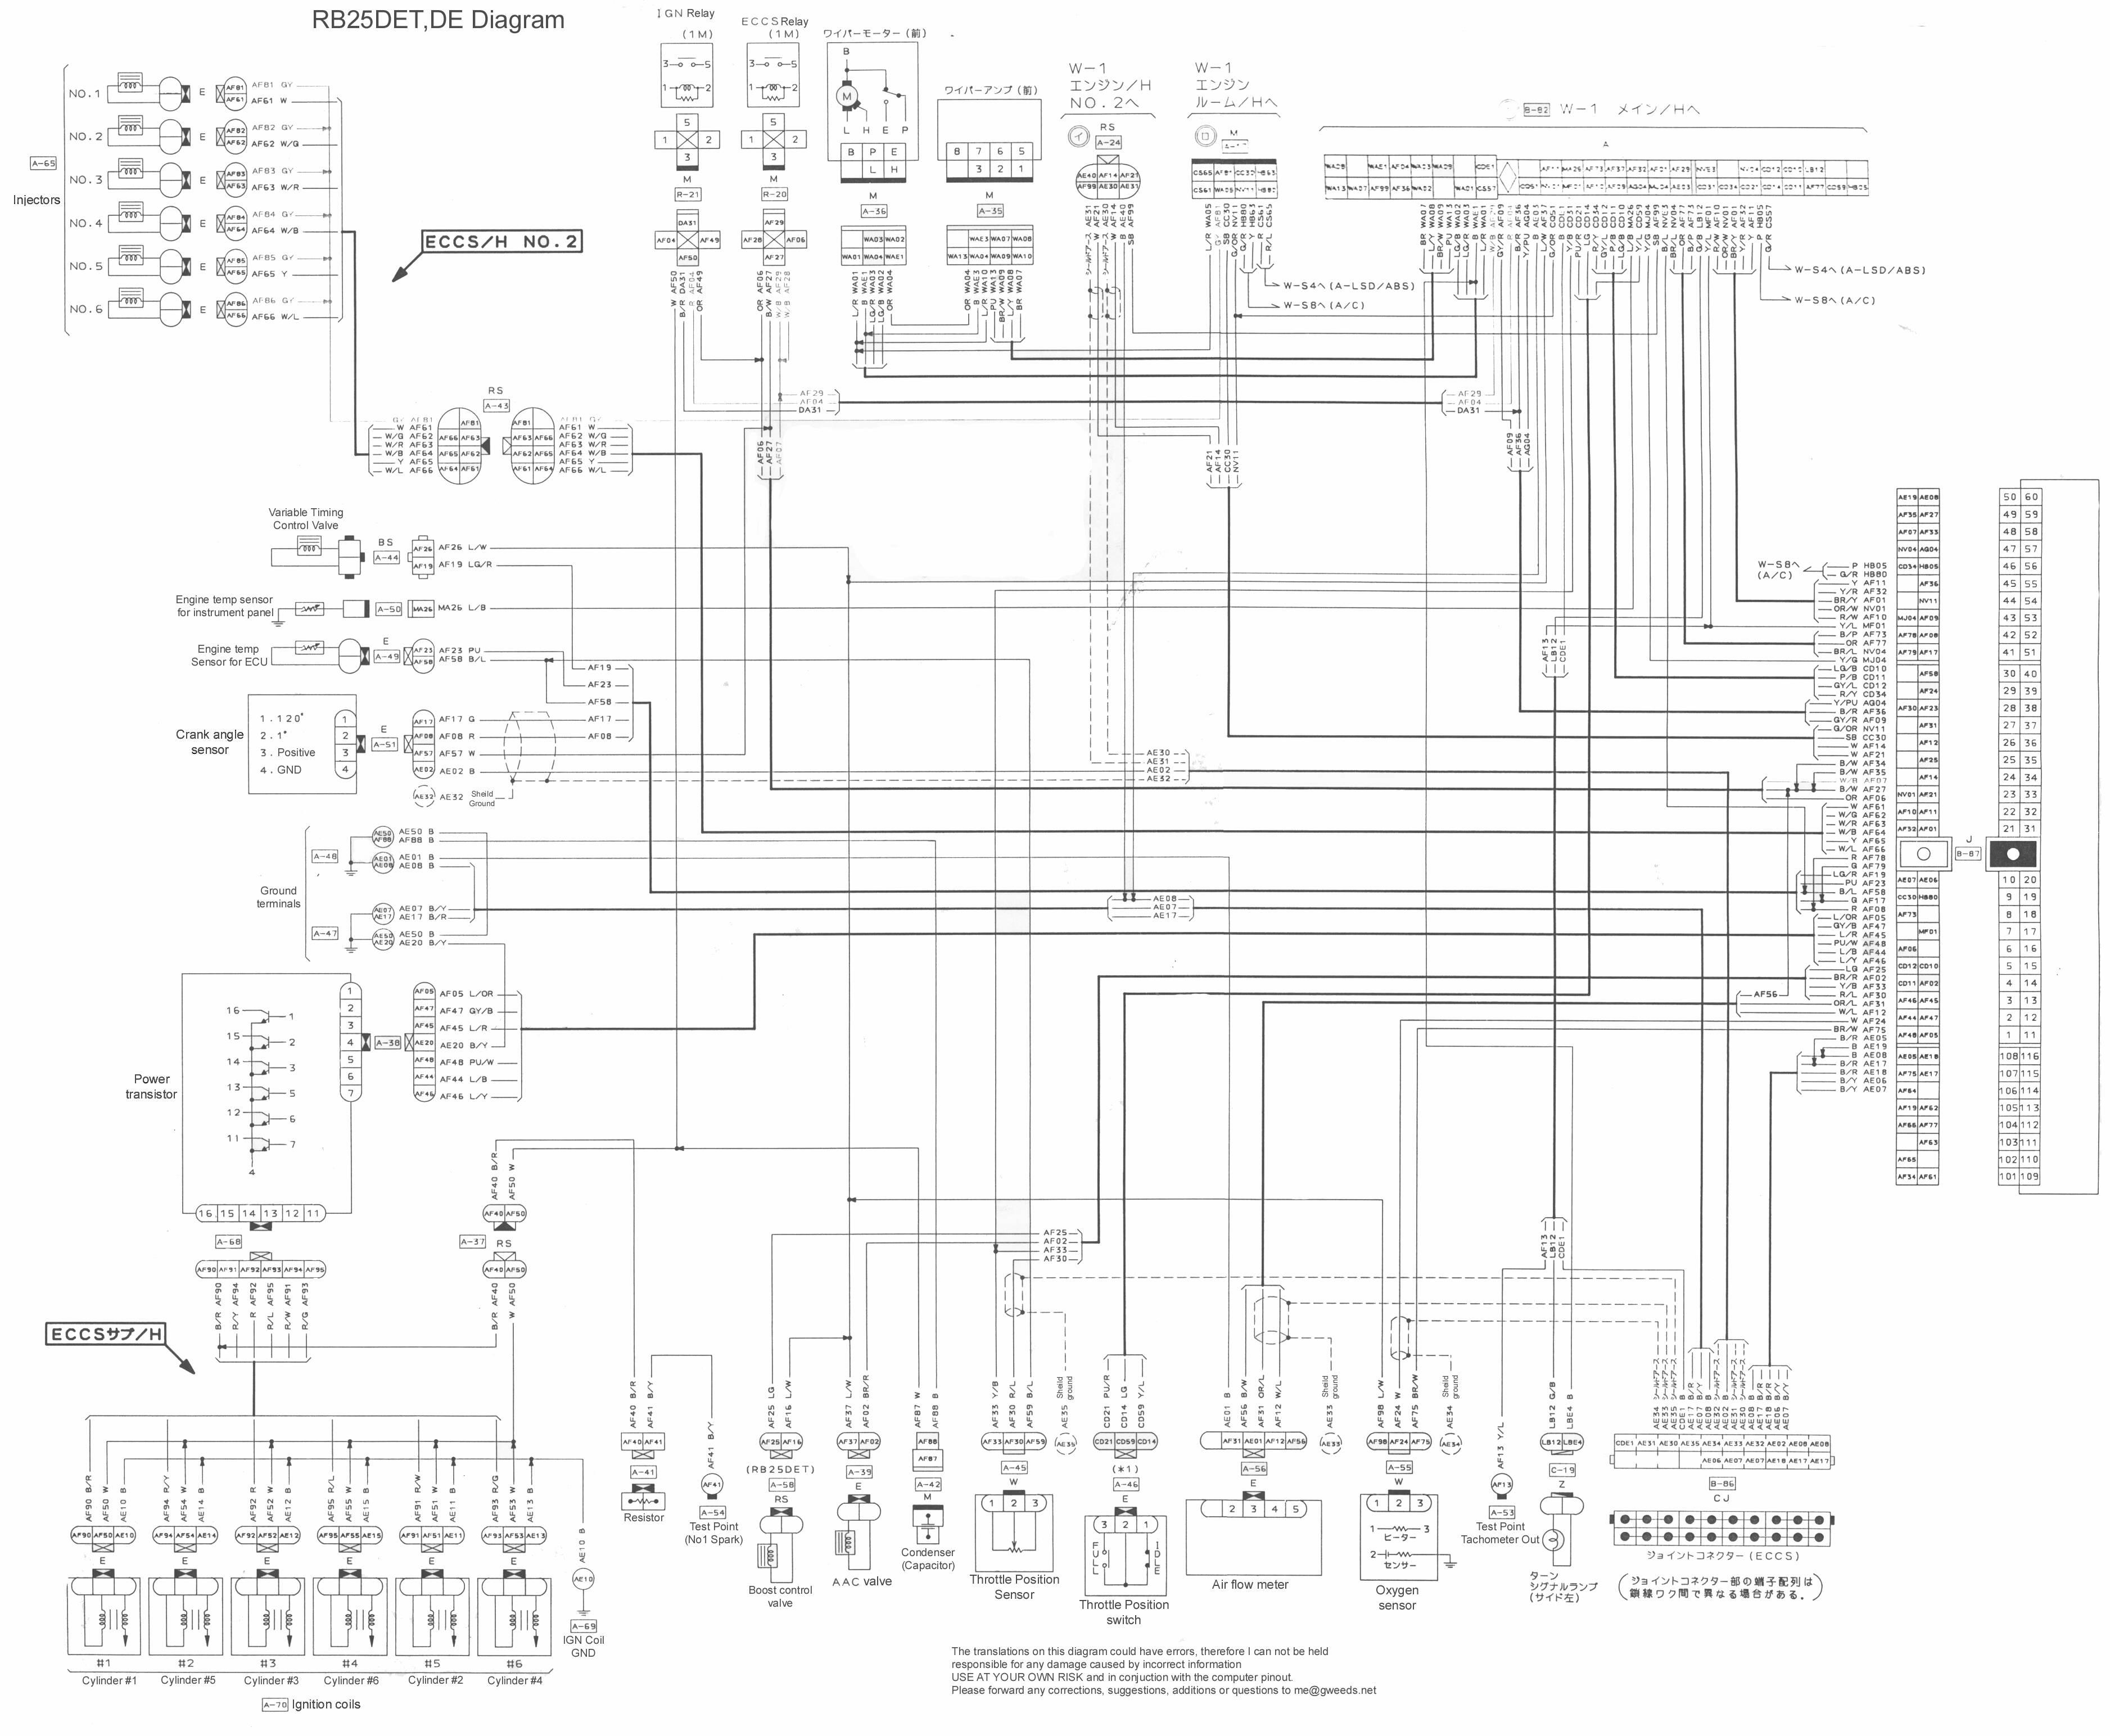 r32 skyline wiper motor wiring diagram